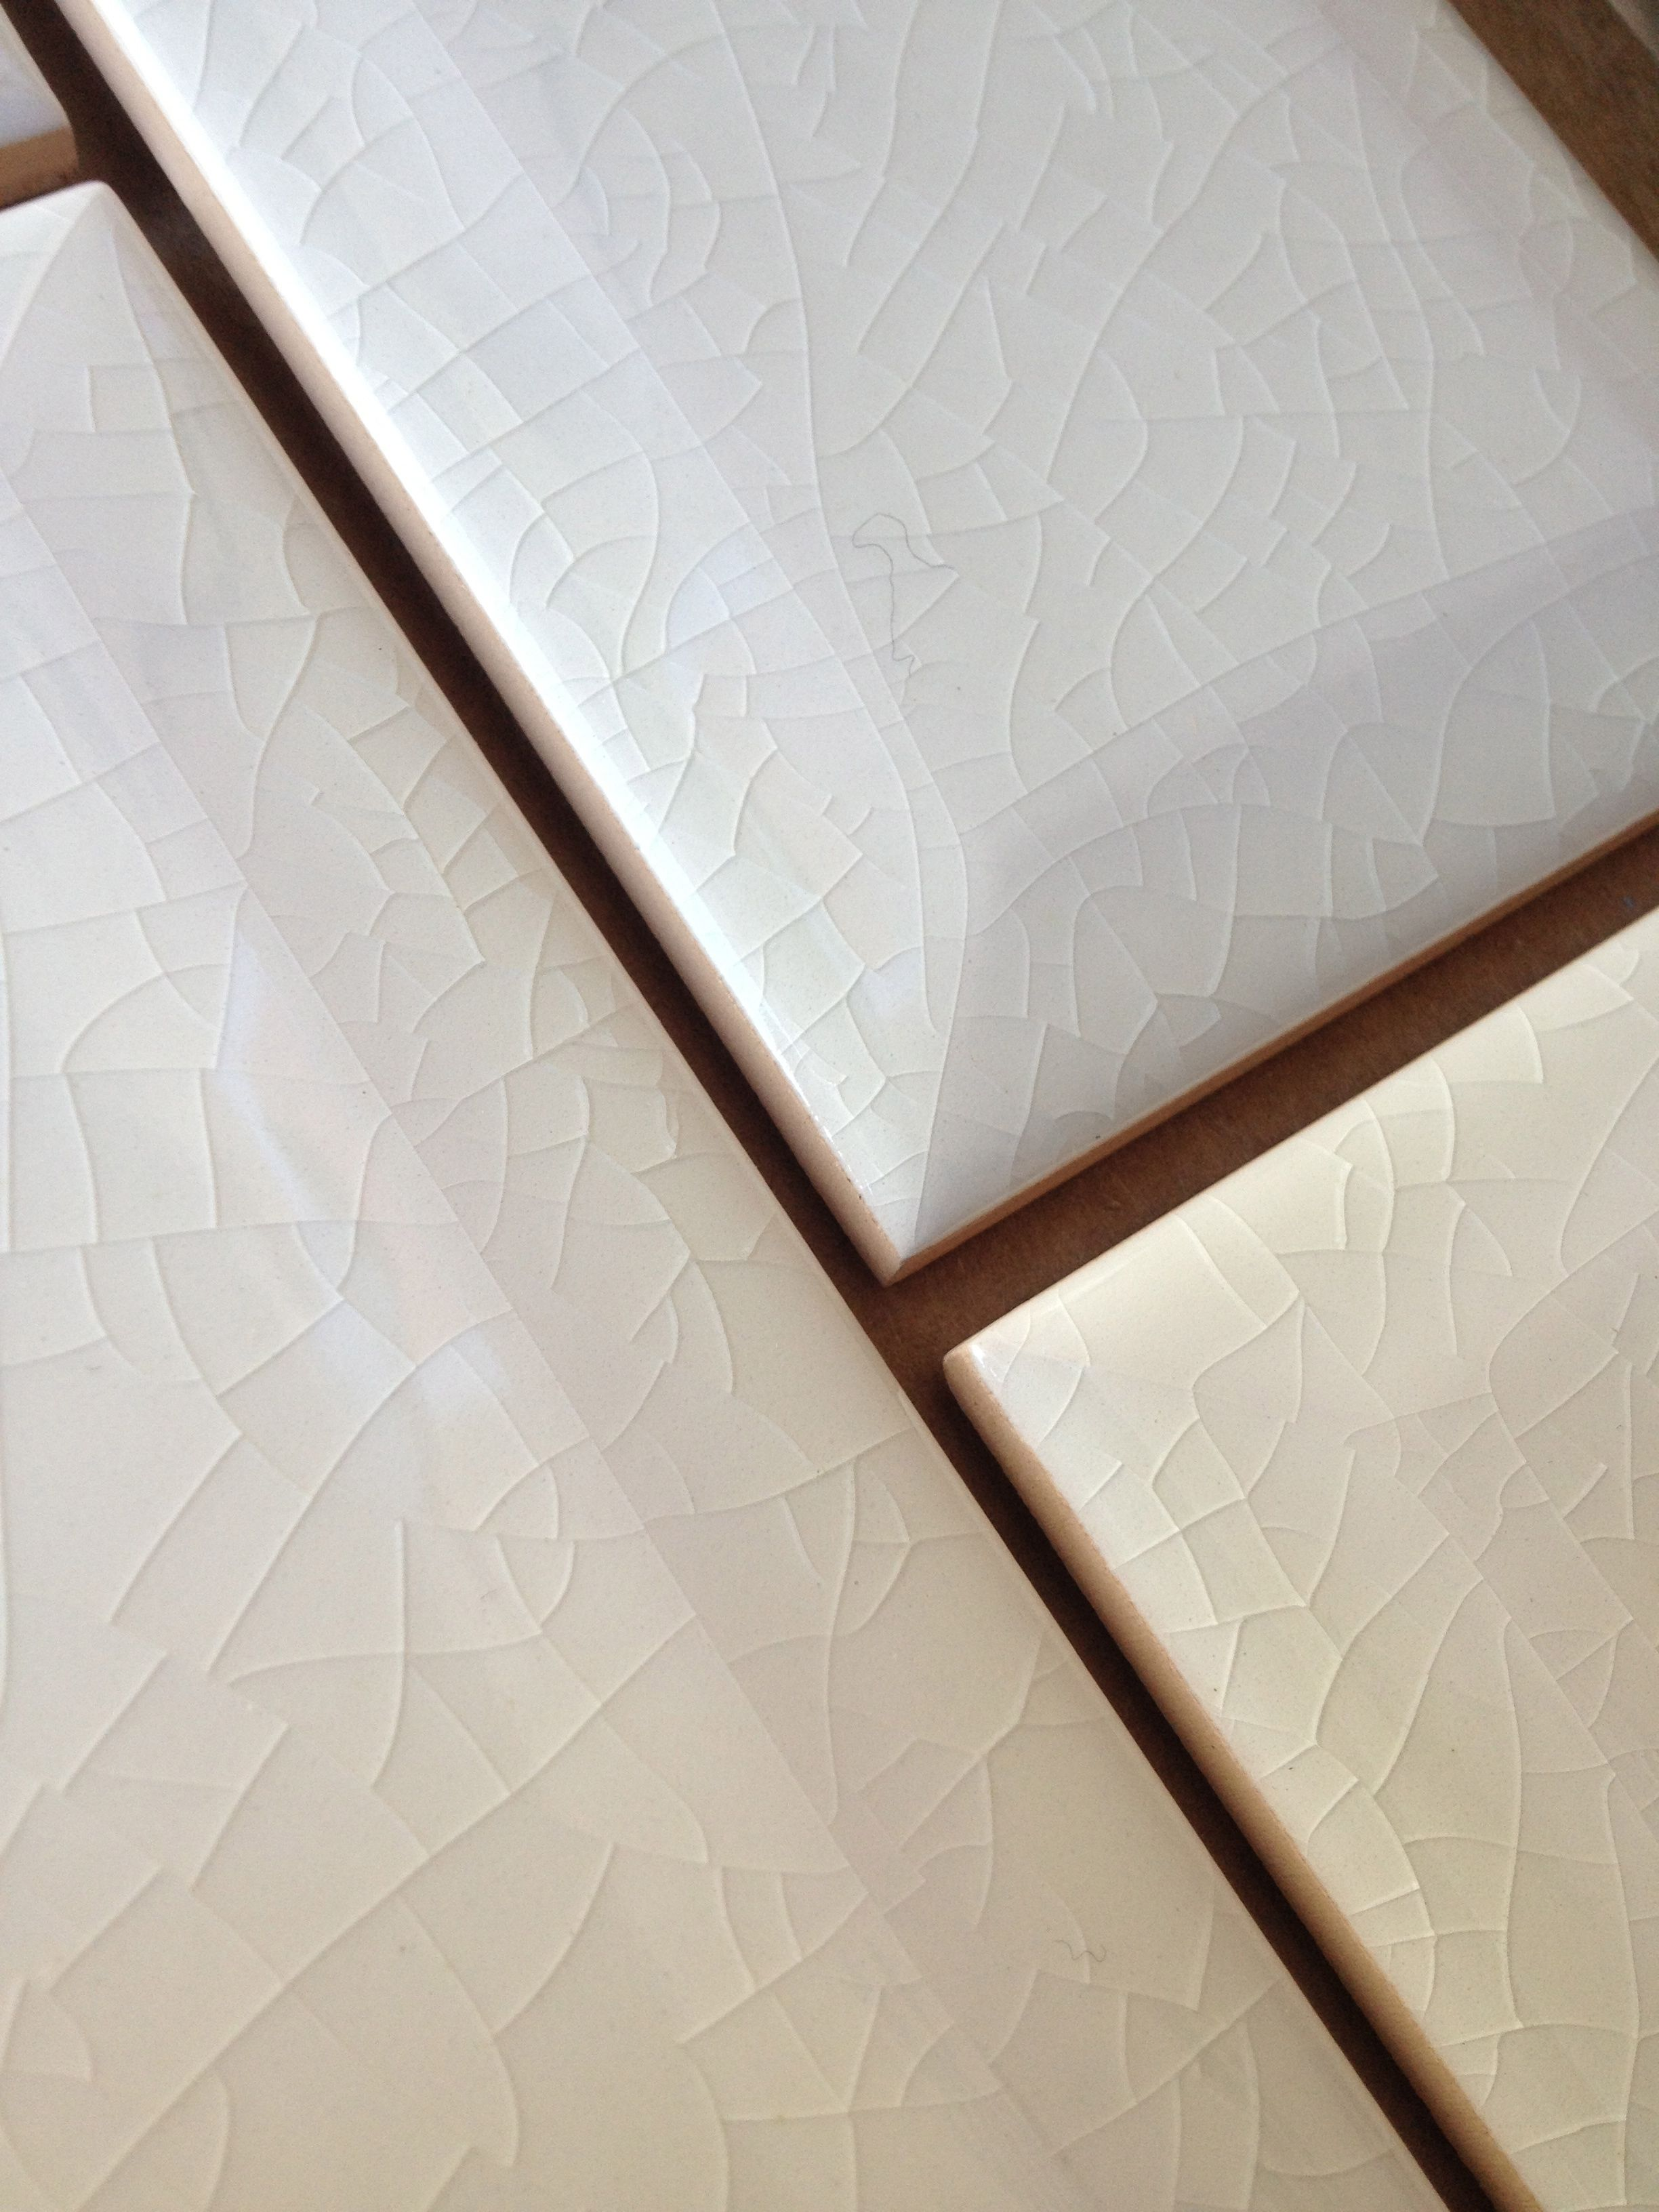 Subway Tile For The Backsplash Has A Delicate Crackle Finish